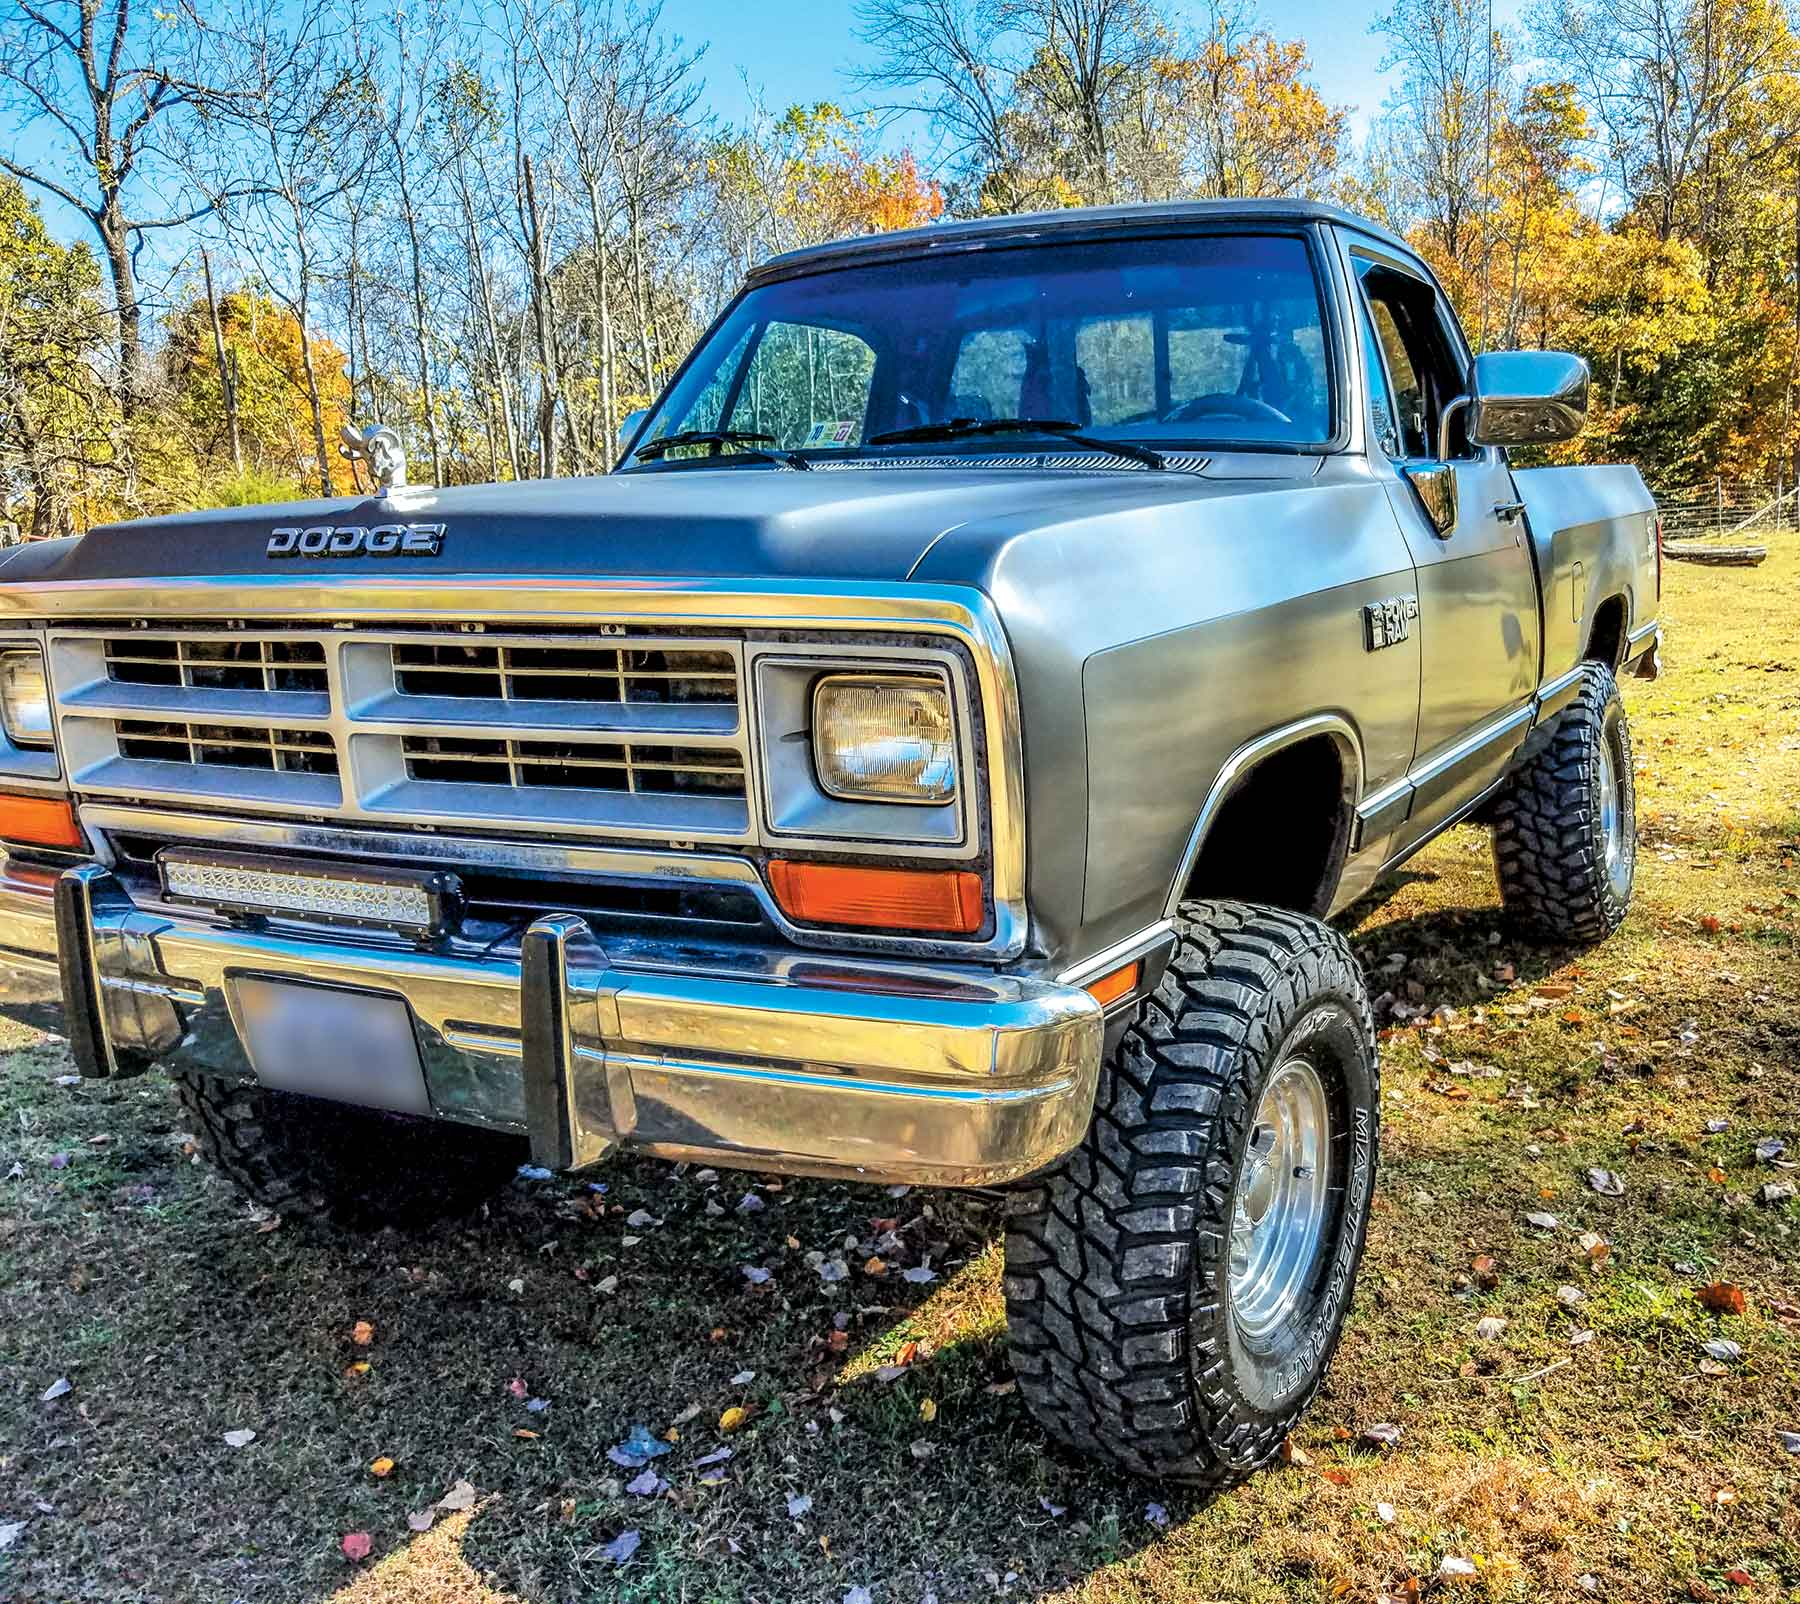 1989 Dodge Power Ram Aj Burks Lmc Truck Life